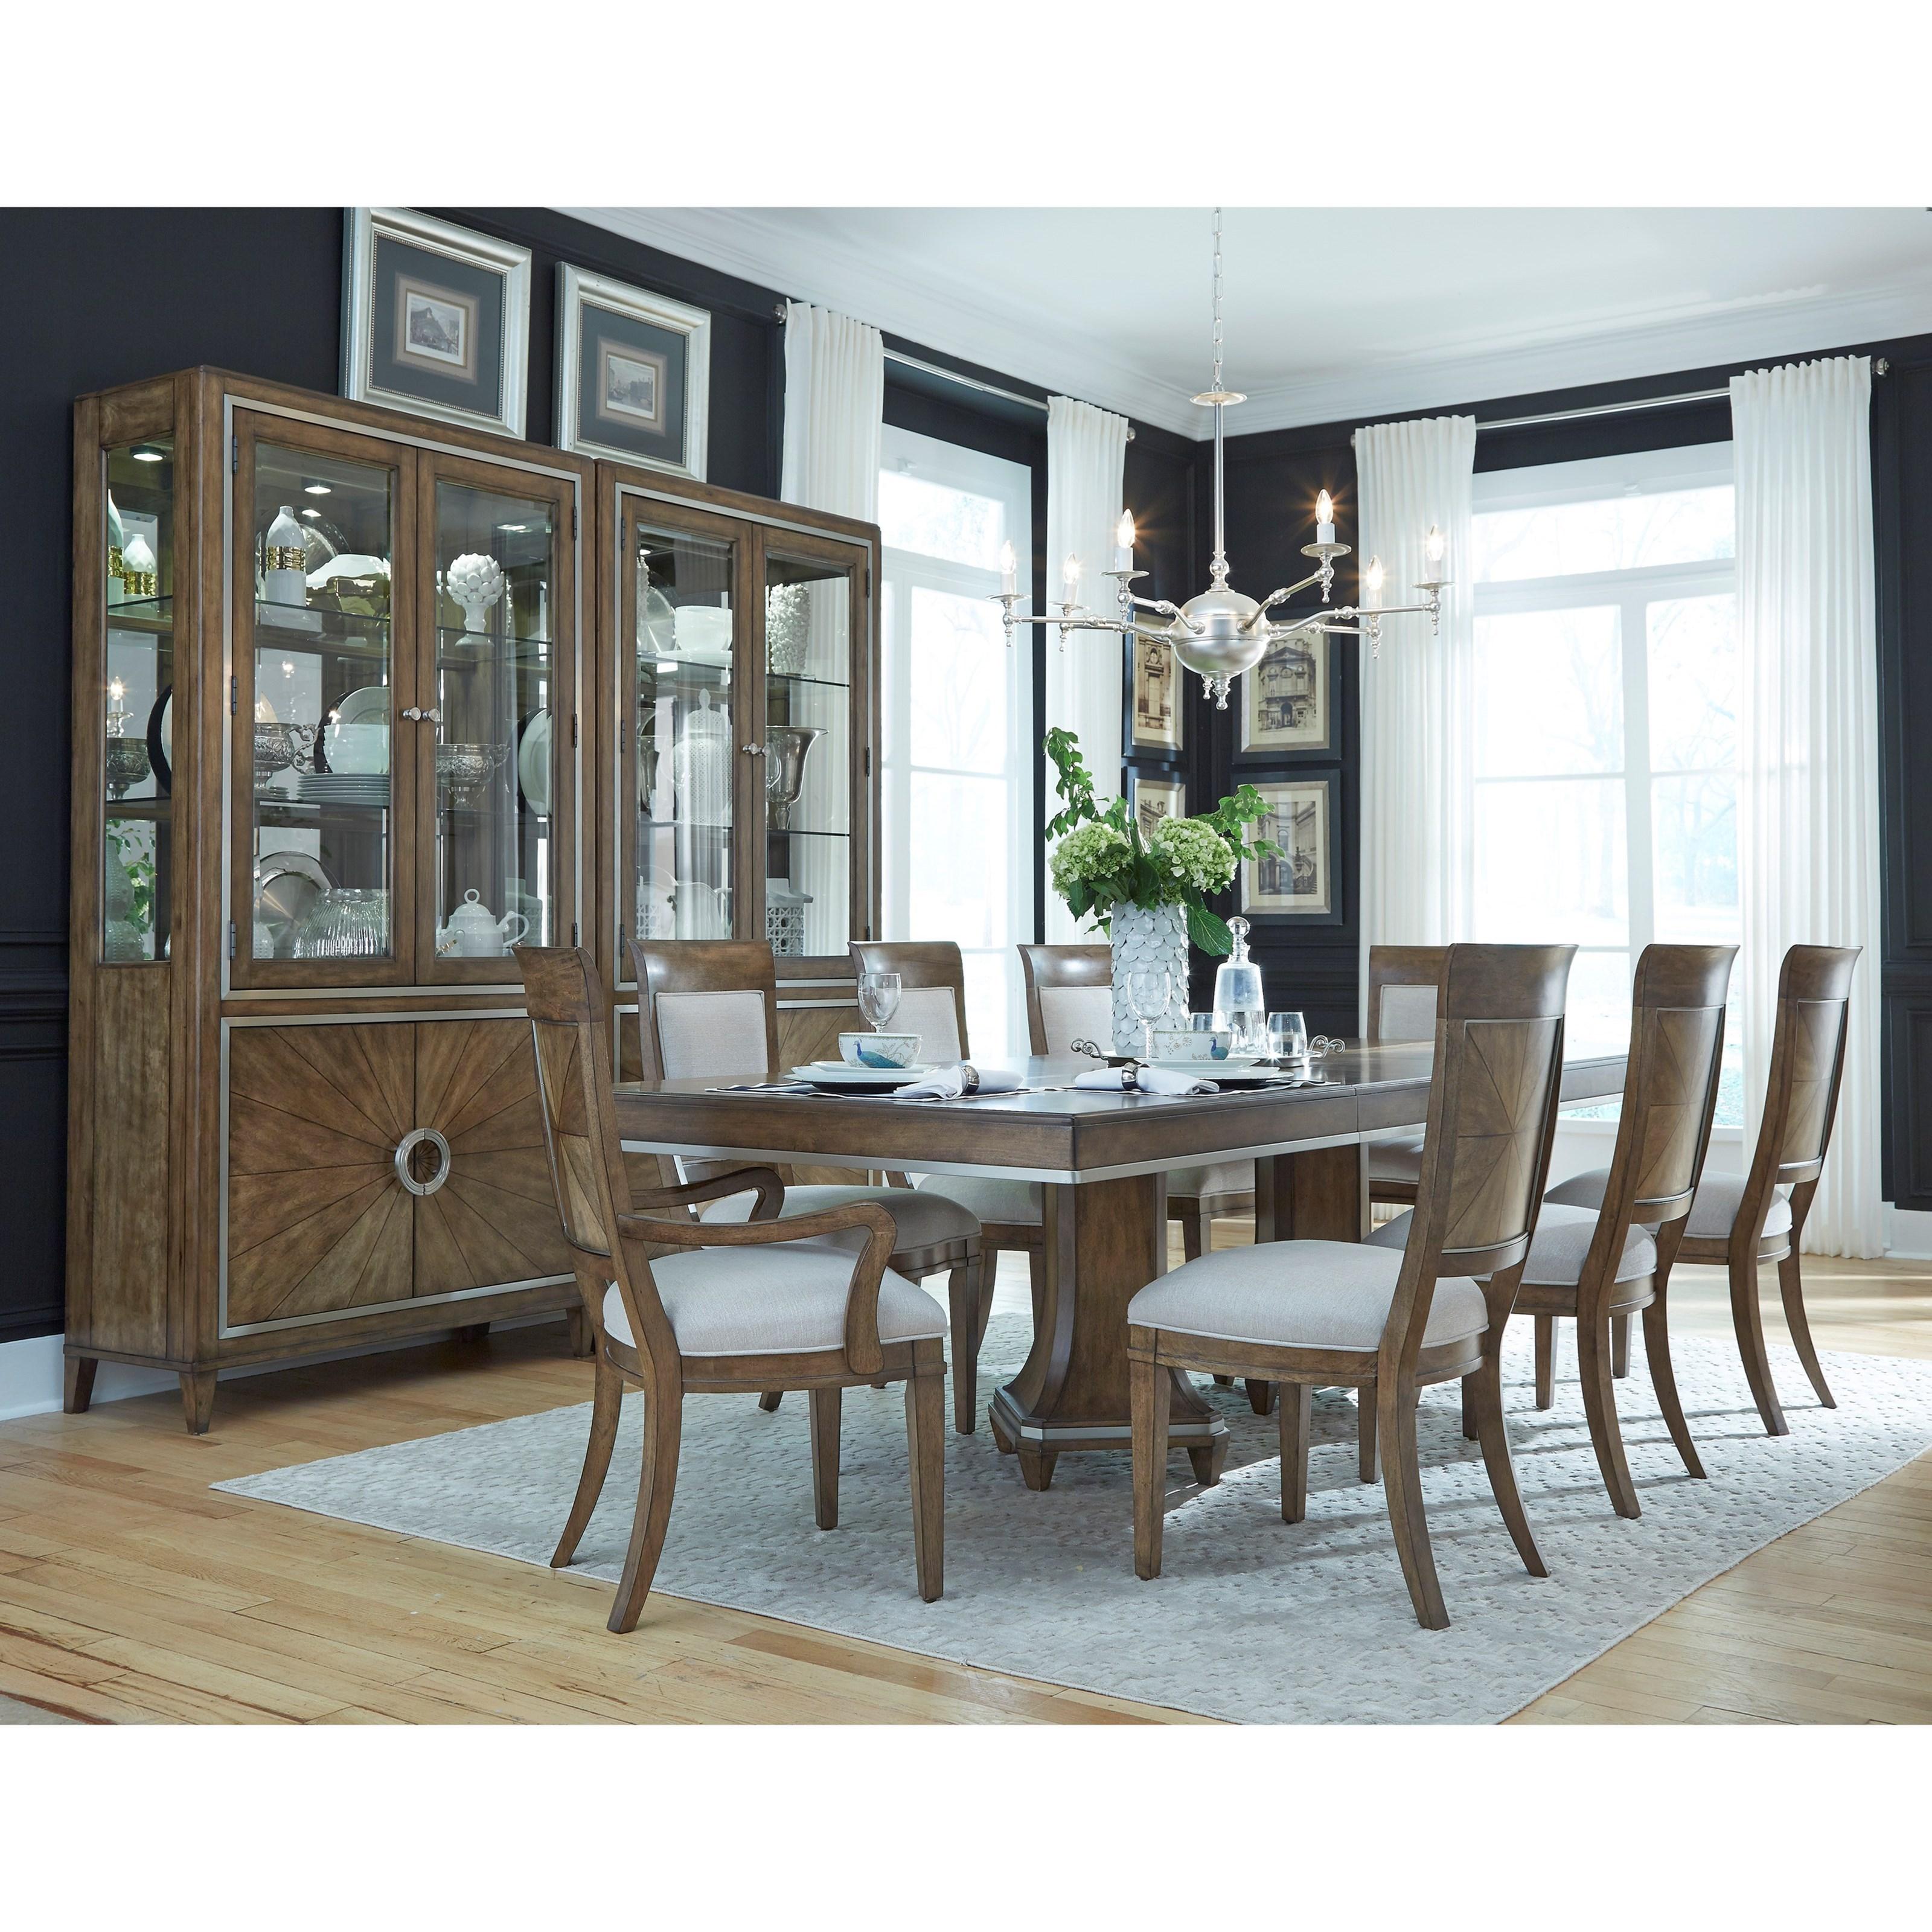 Pulaski Dining Room: Pulaski Furniture Mystic Formal Dining Room Group